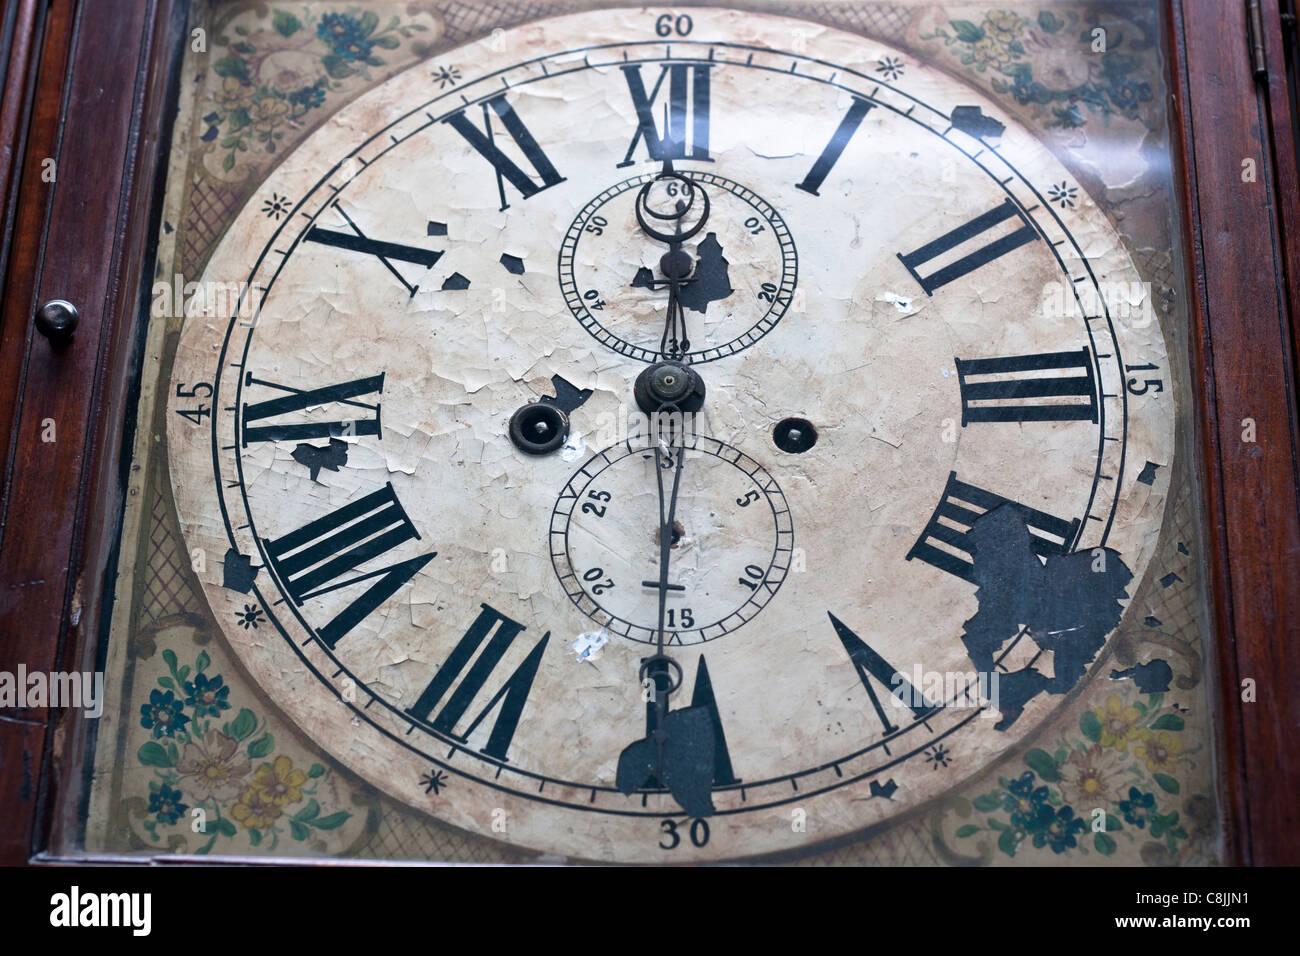 Antique clock face detail. - Stock Image